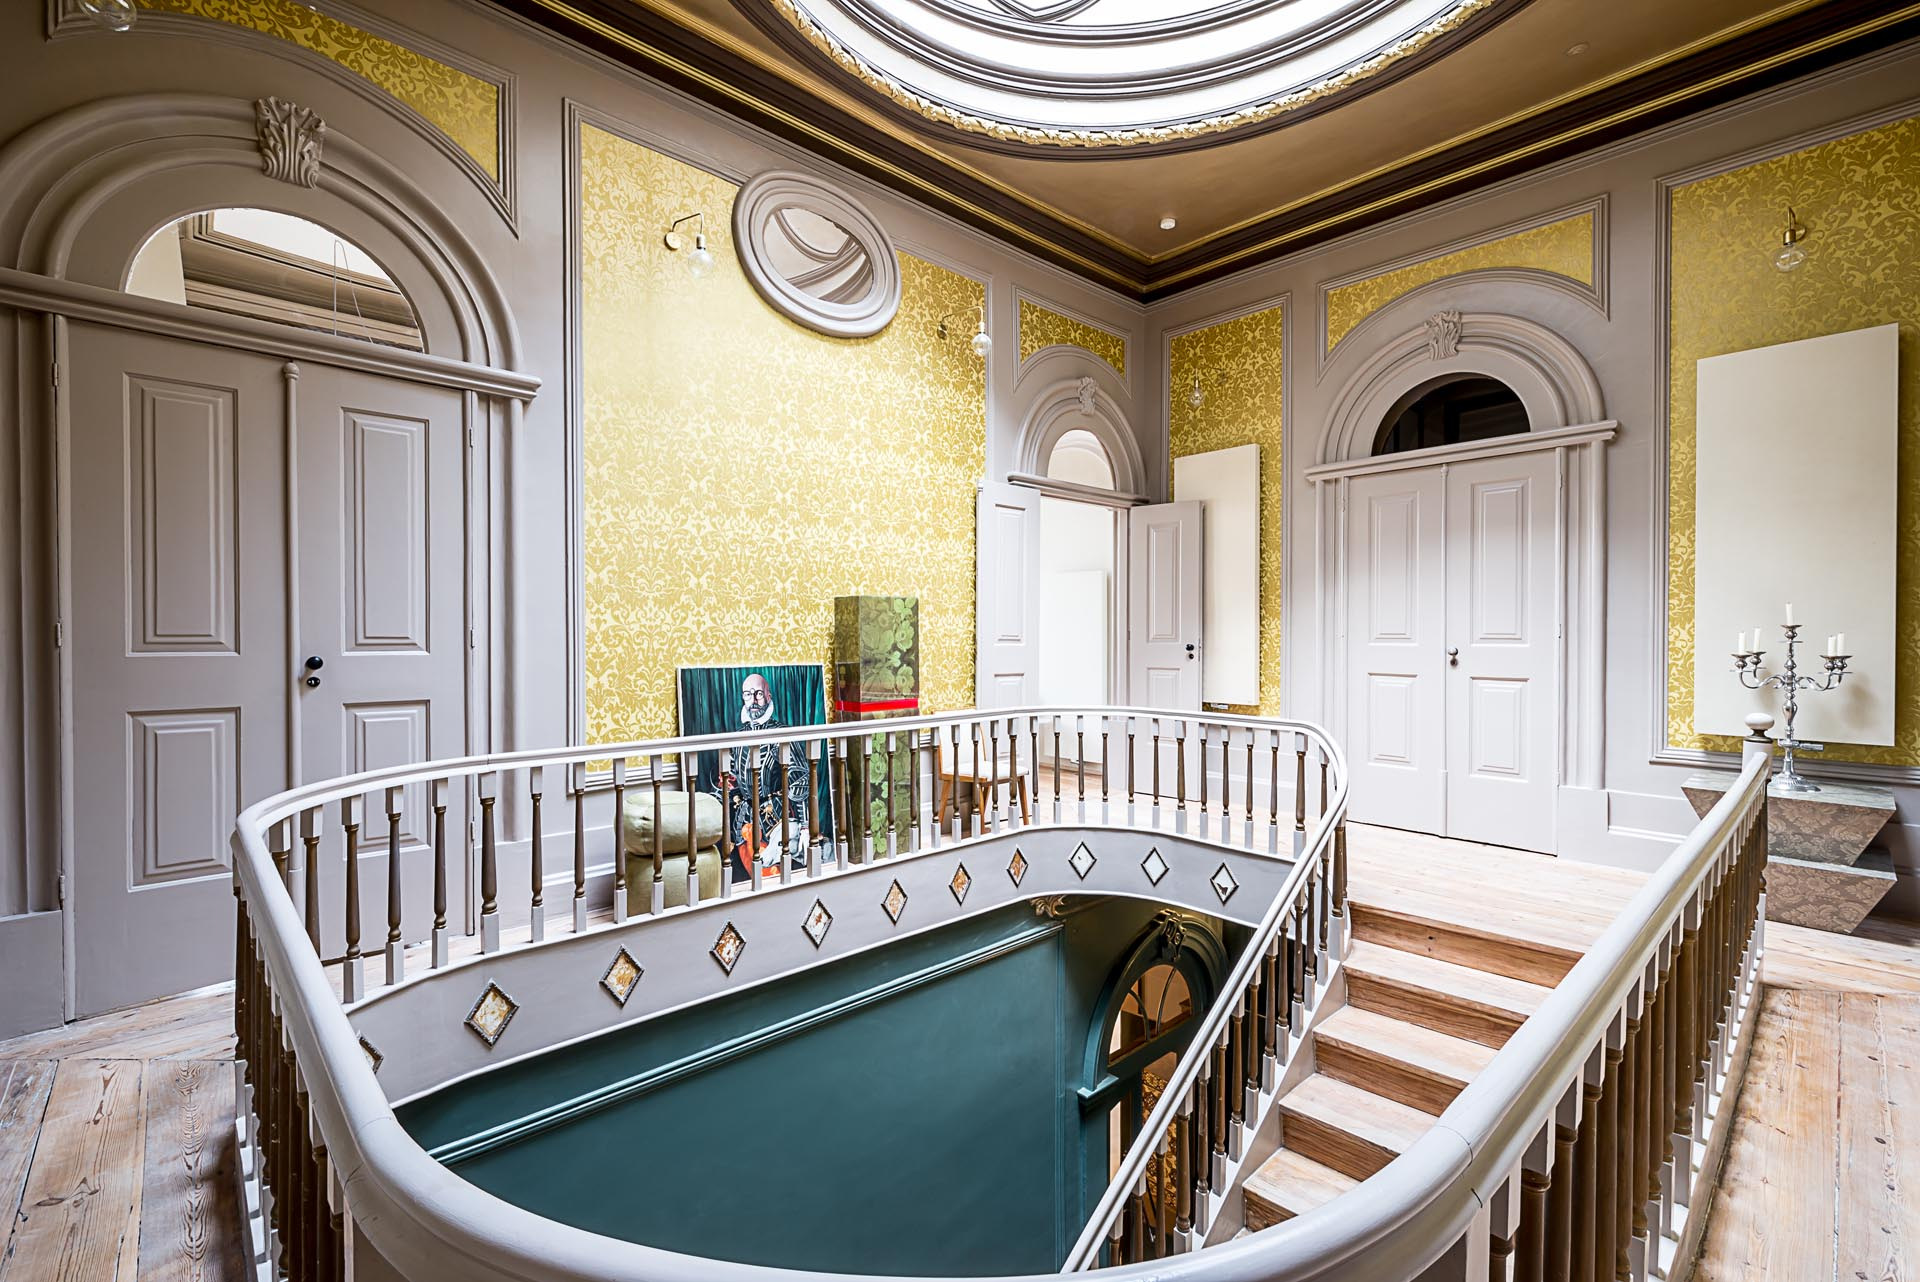 Charm Palace Porto escada claraboia | Stairs skylight